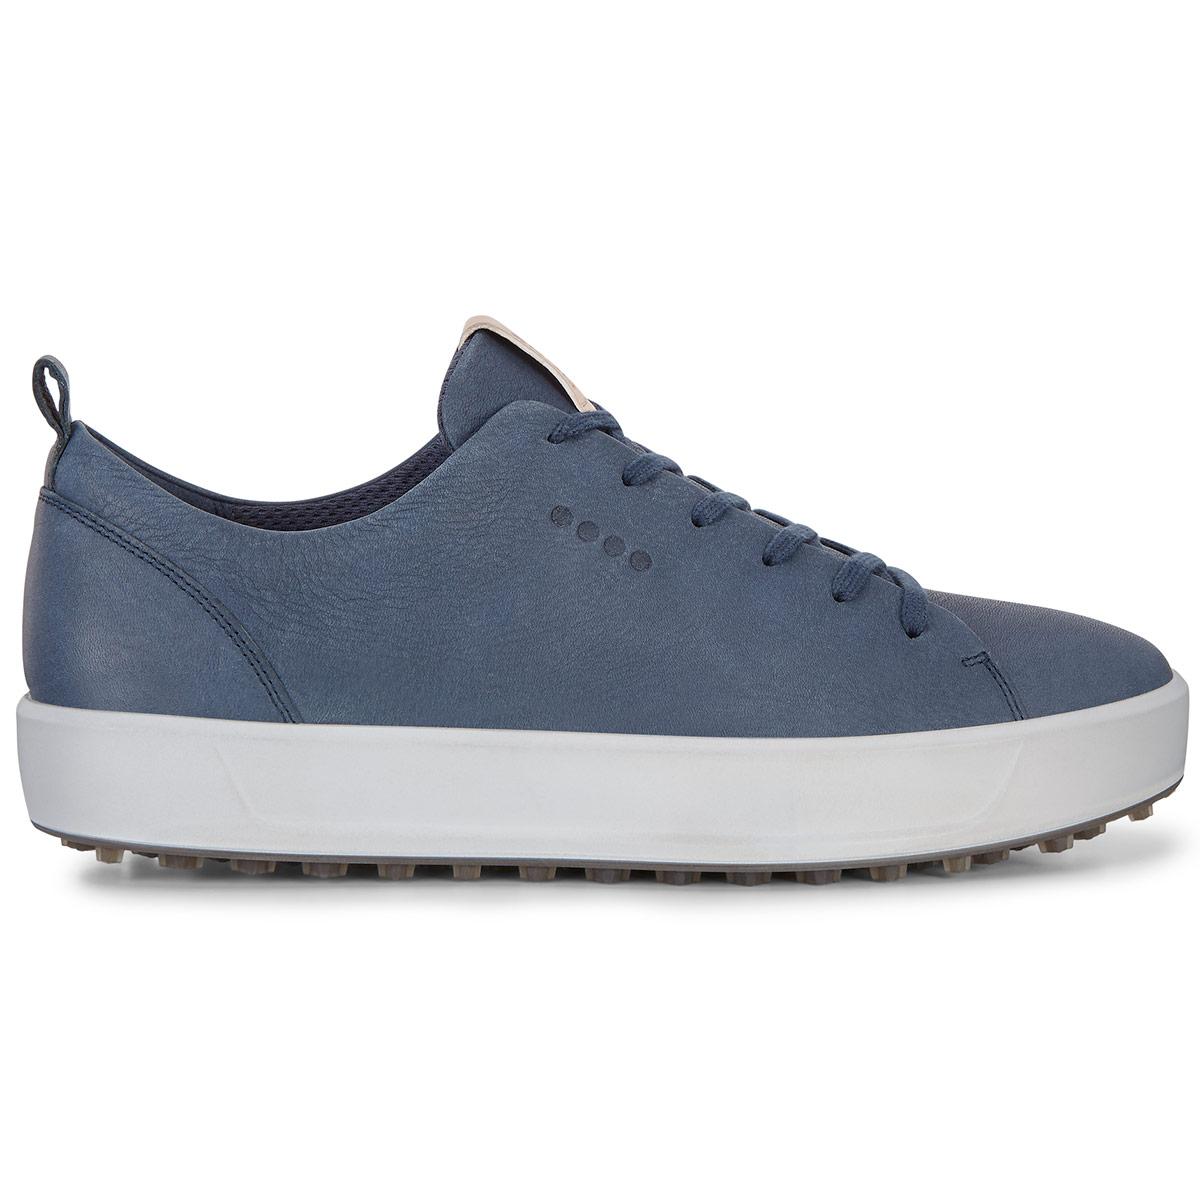 ECCO Golf Soft Shoes